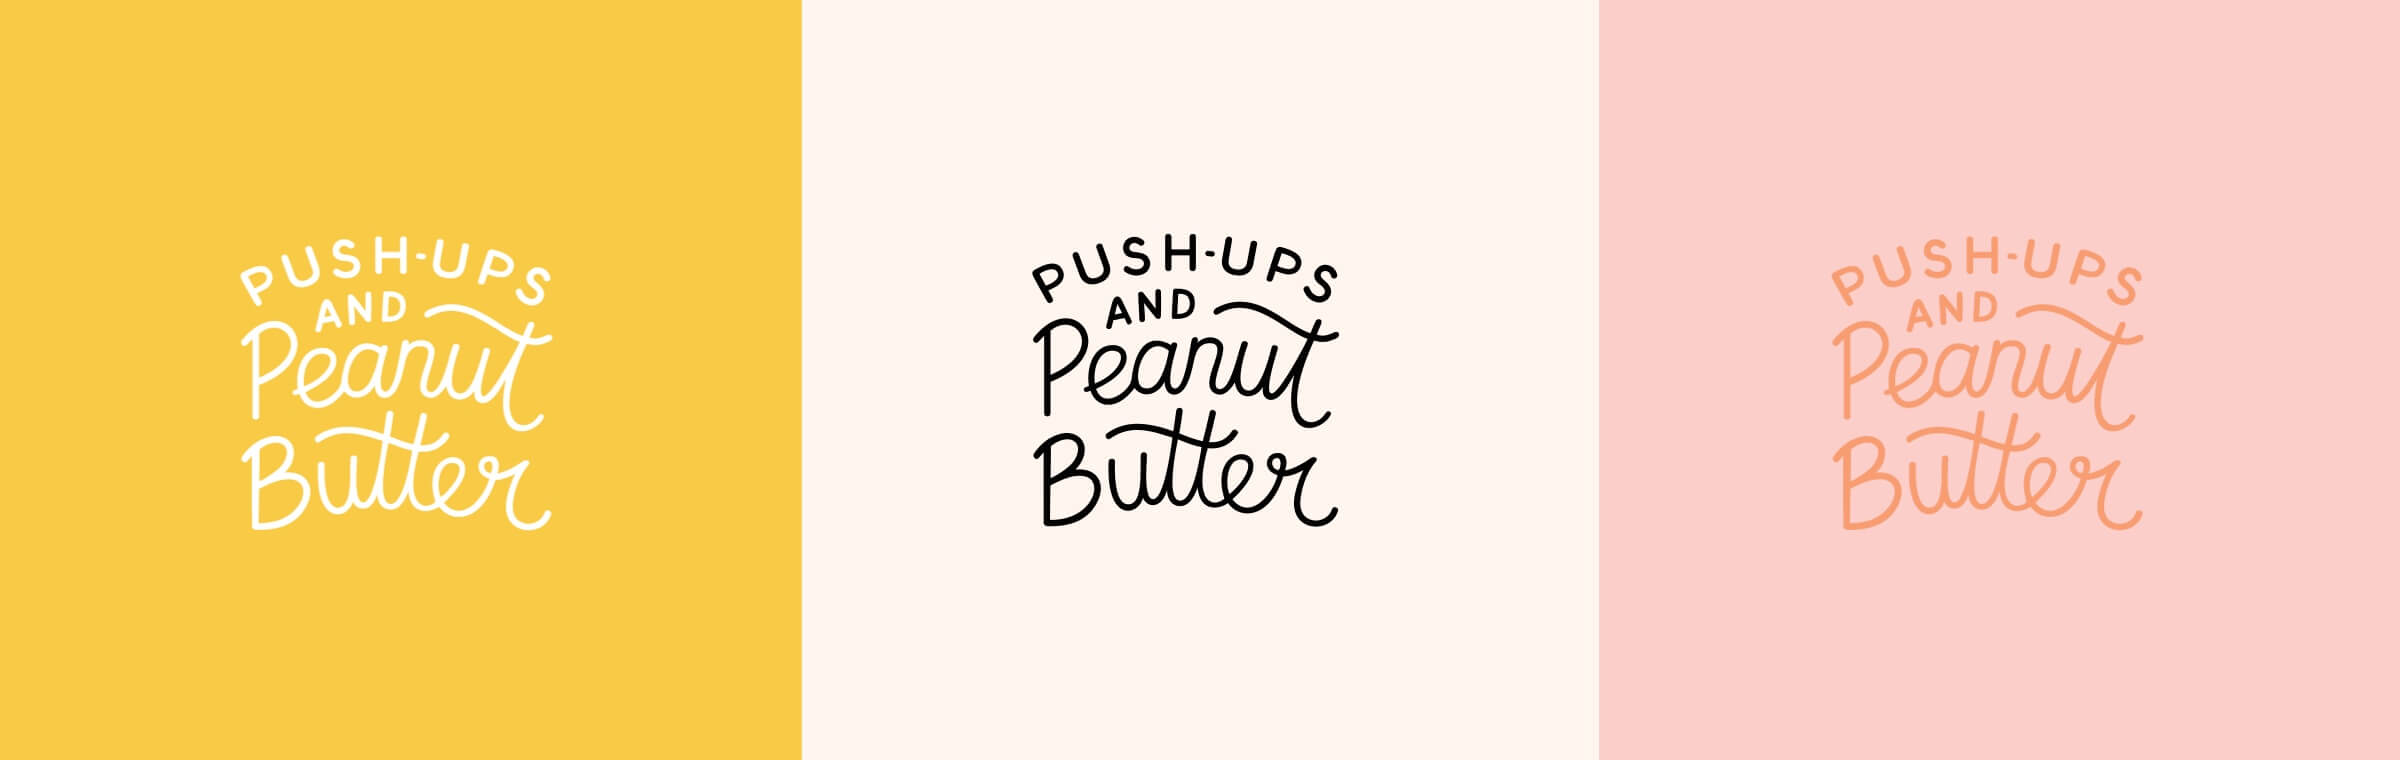 Push-ups and Peanut Butter logo